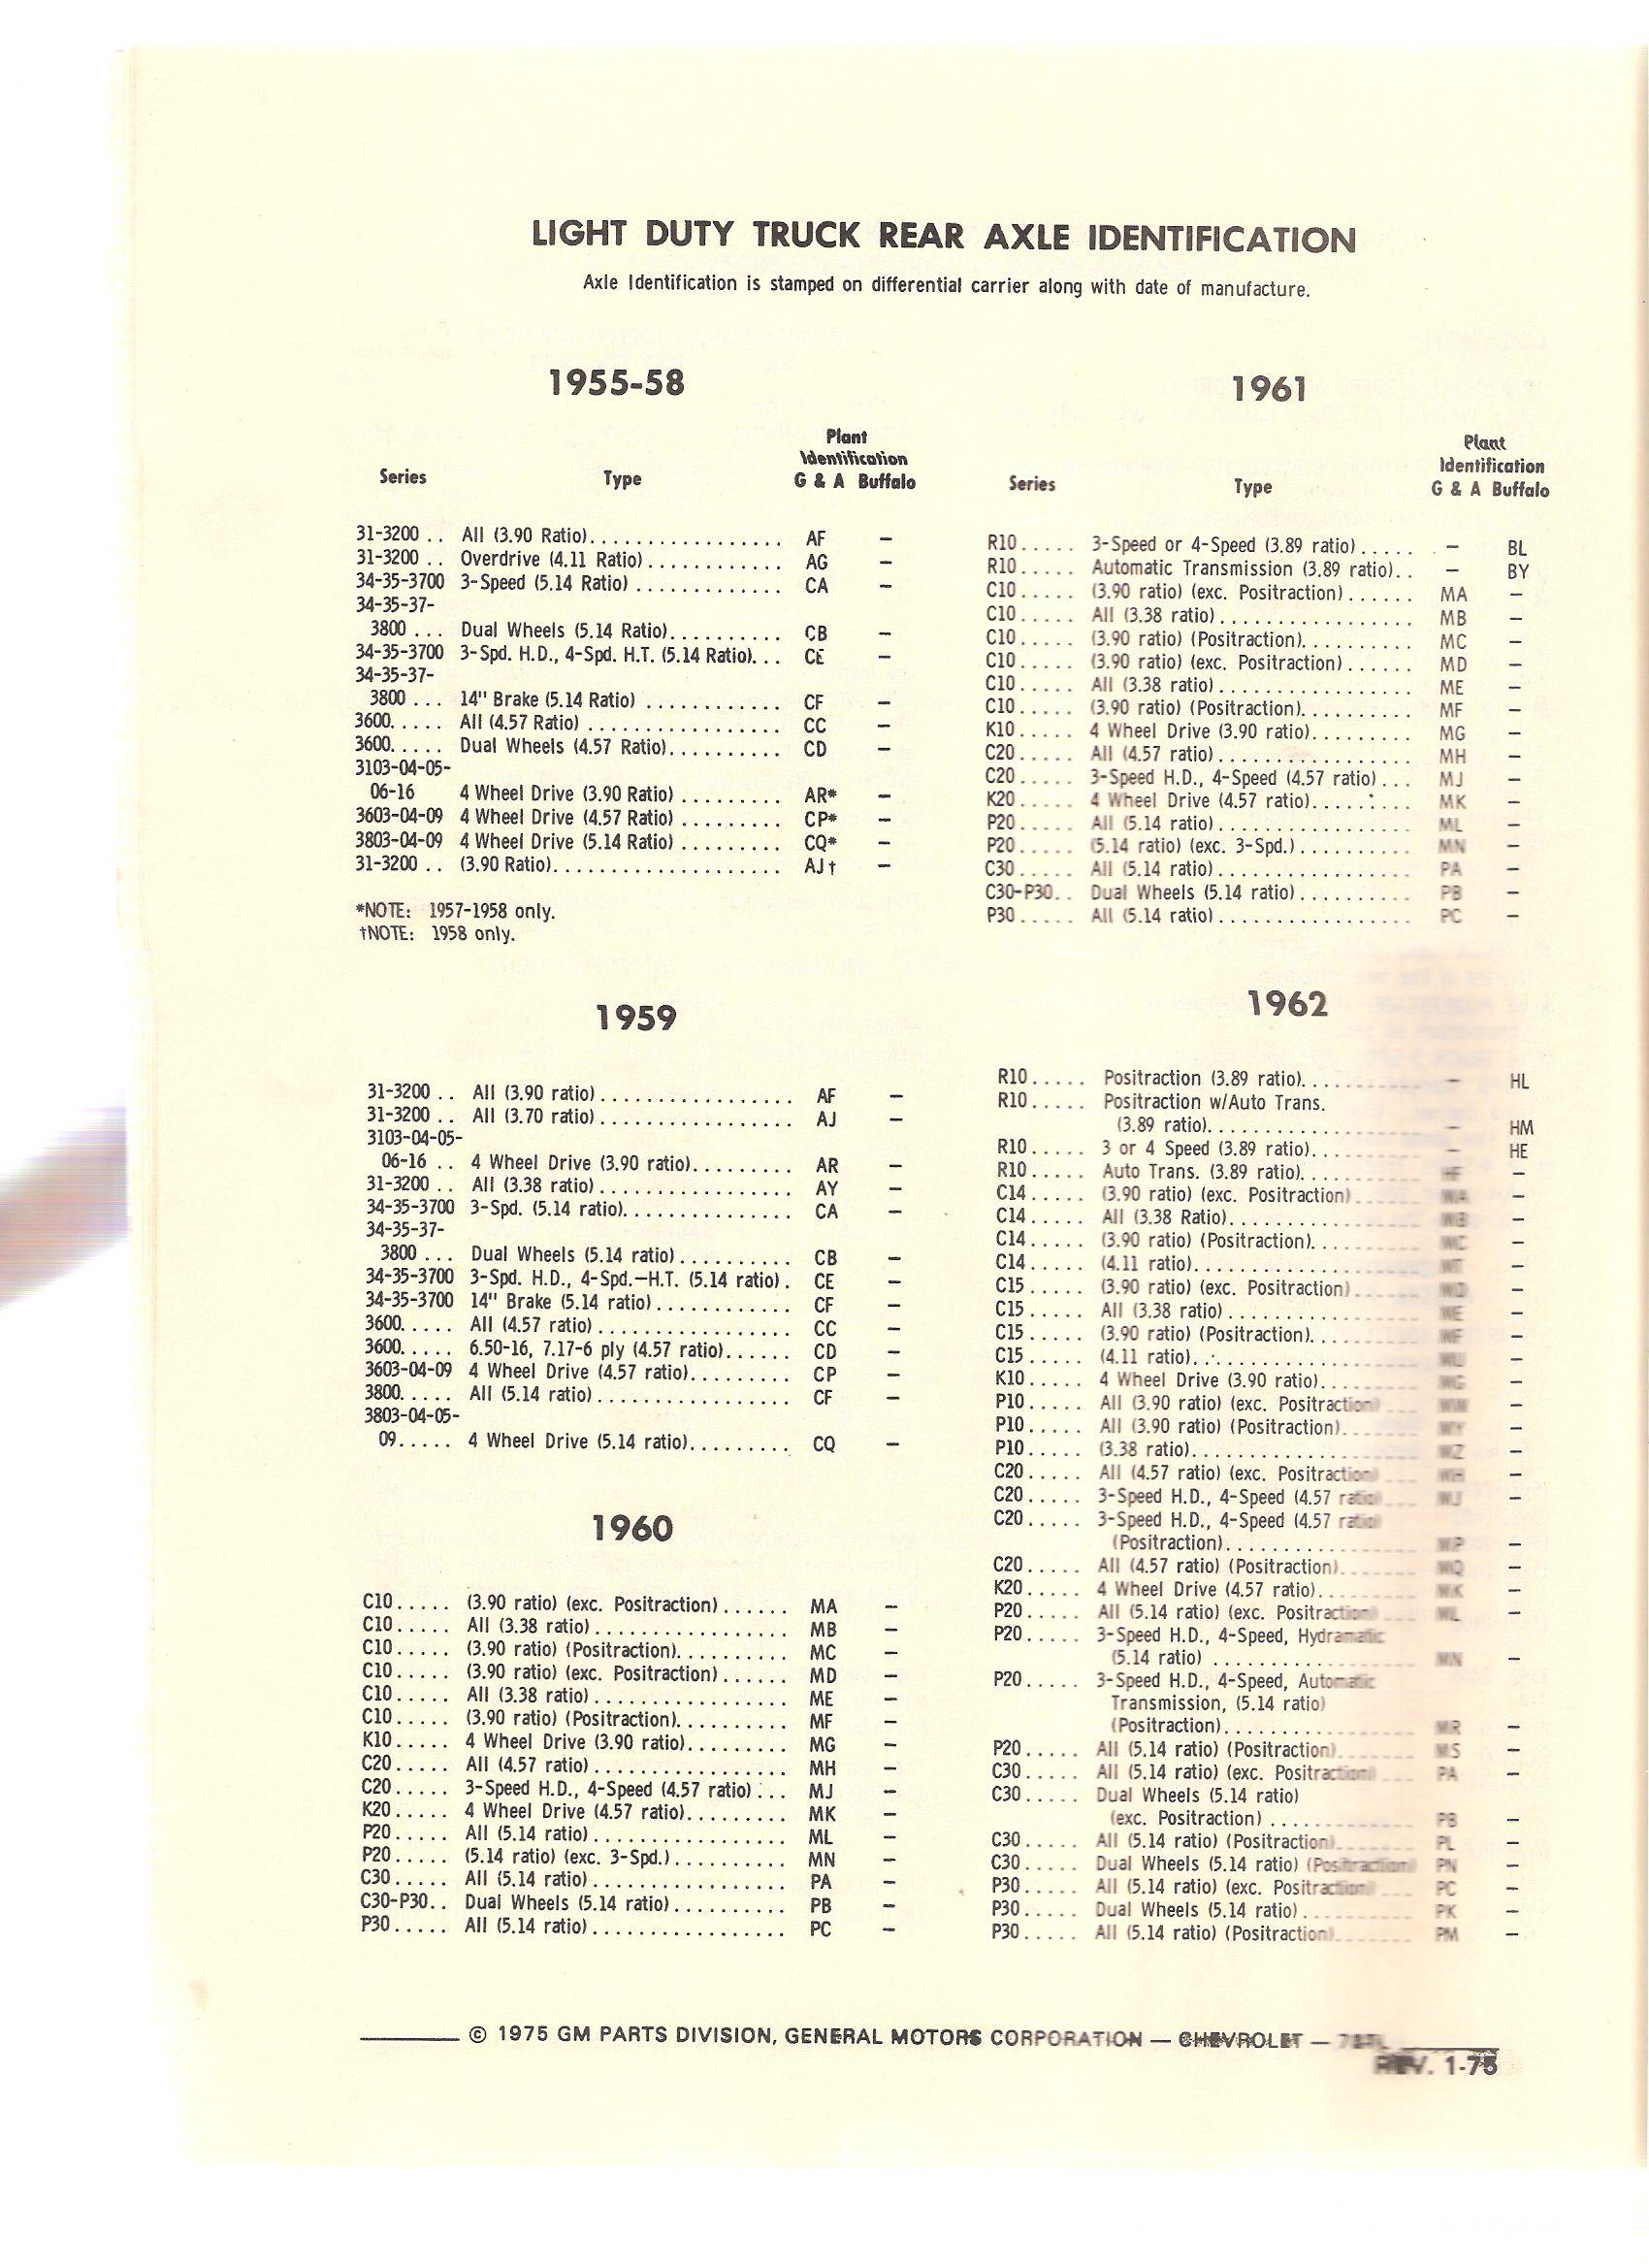 19601966 ChevyGMC Pickup Truck Specs & EngineTransAxle ID's  The 1947  Present Chevrolet